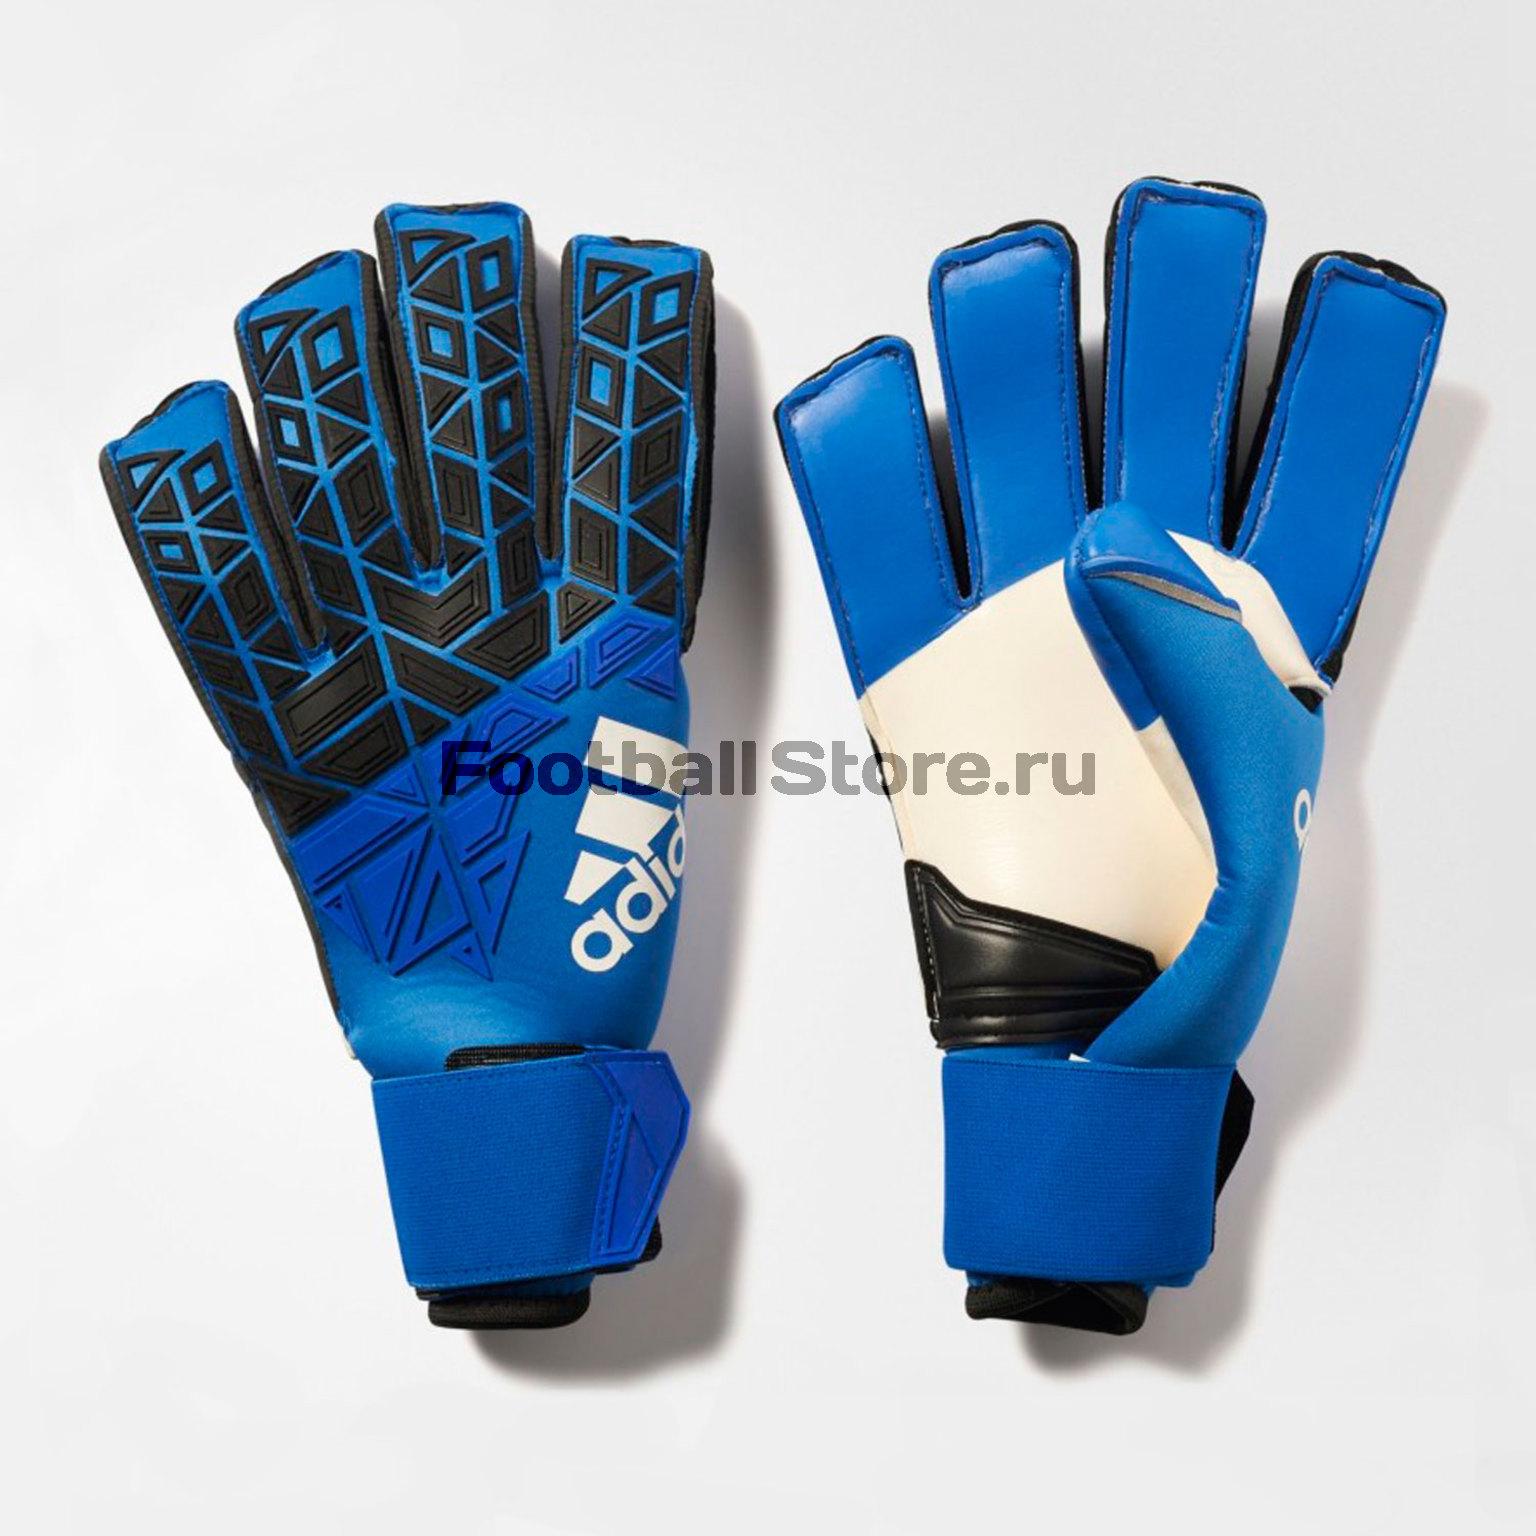 Перчатки вратарские Adidas Ace FS Promo AZ3707 перчатки adidas перчатки adidas ace zones ultim ah7802